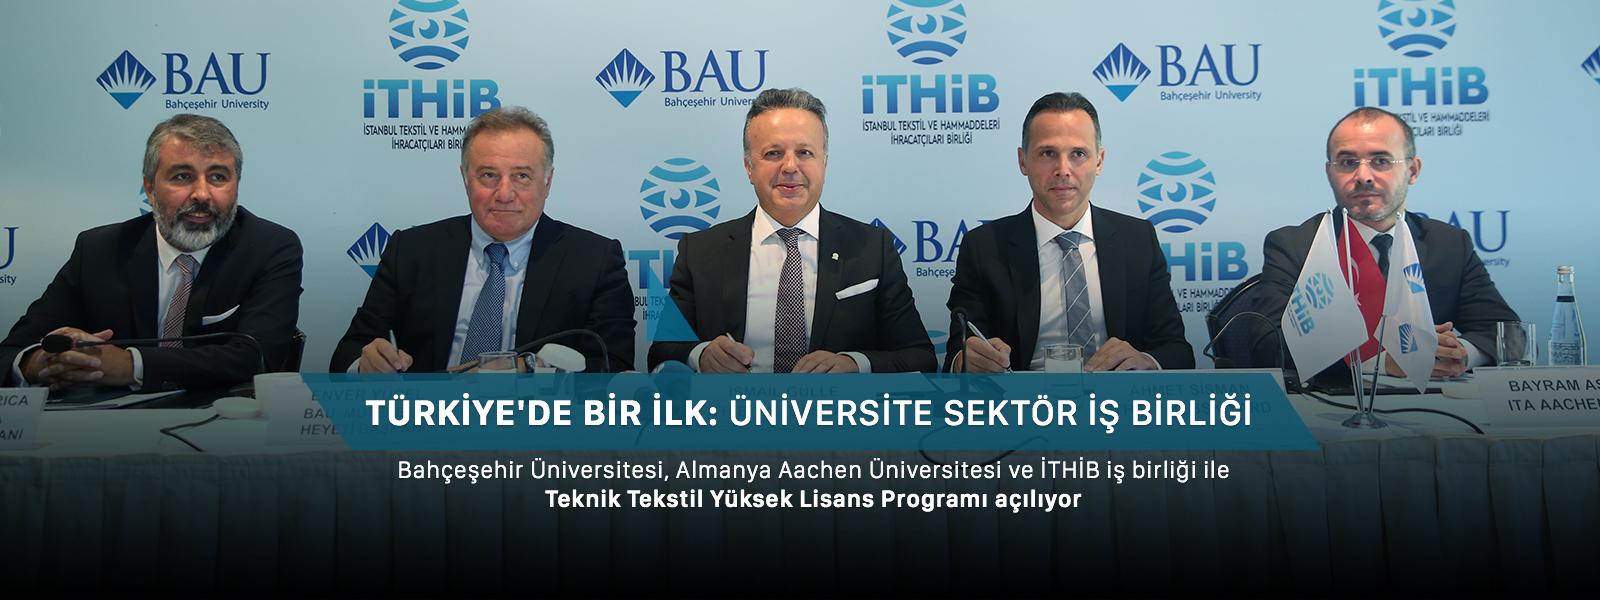 http://content.bahcesehir.edu.tr/bahçeşehir üniversitesi, ithib, teknik tekstil yüksek lisans